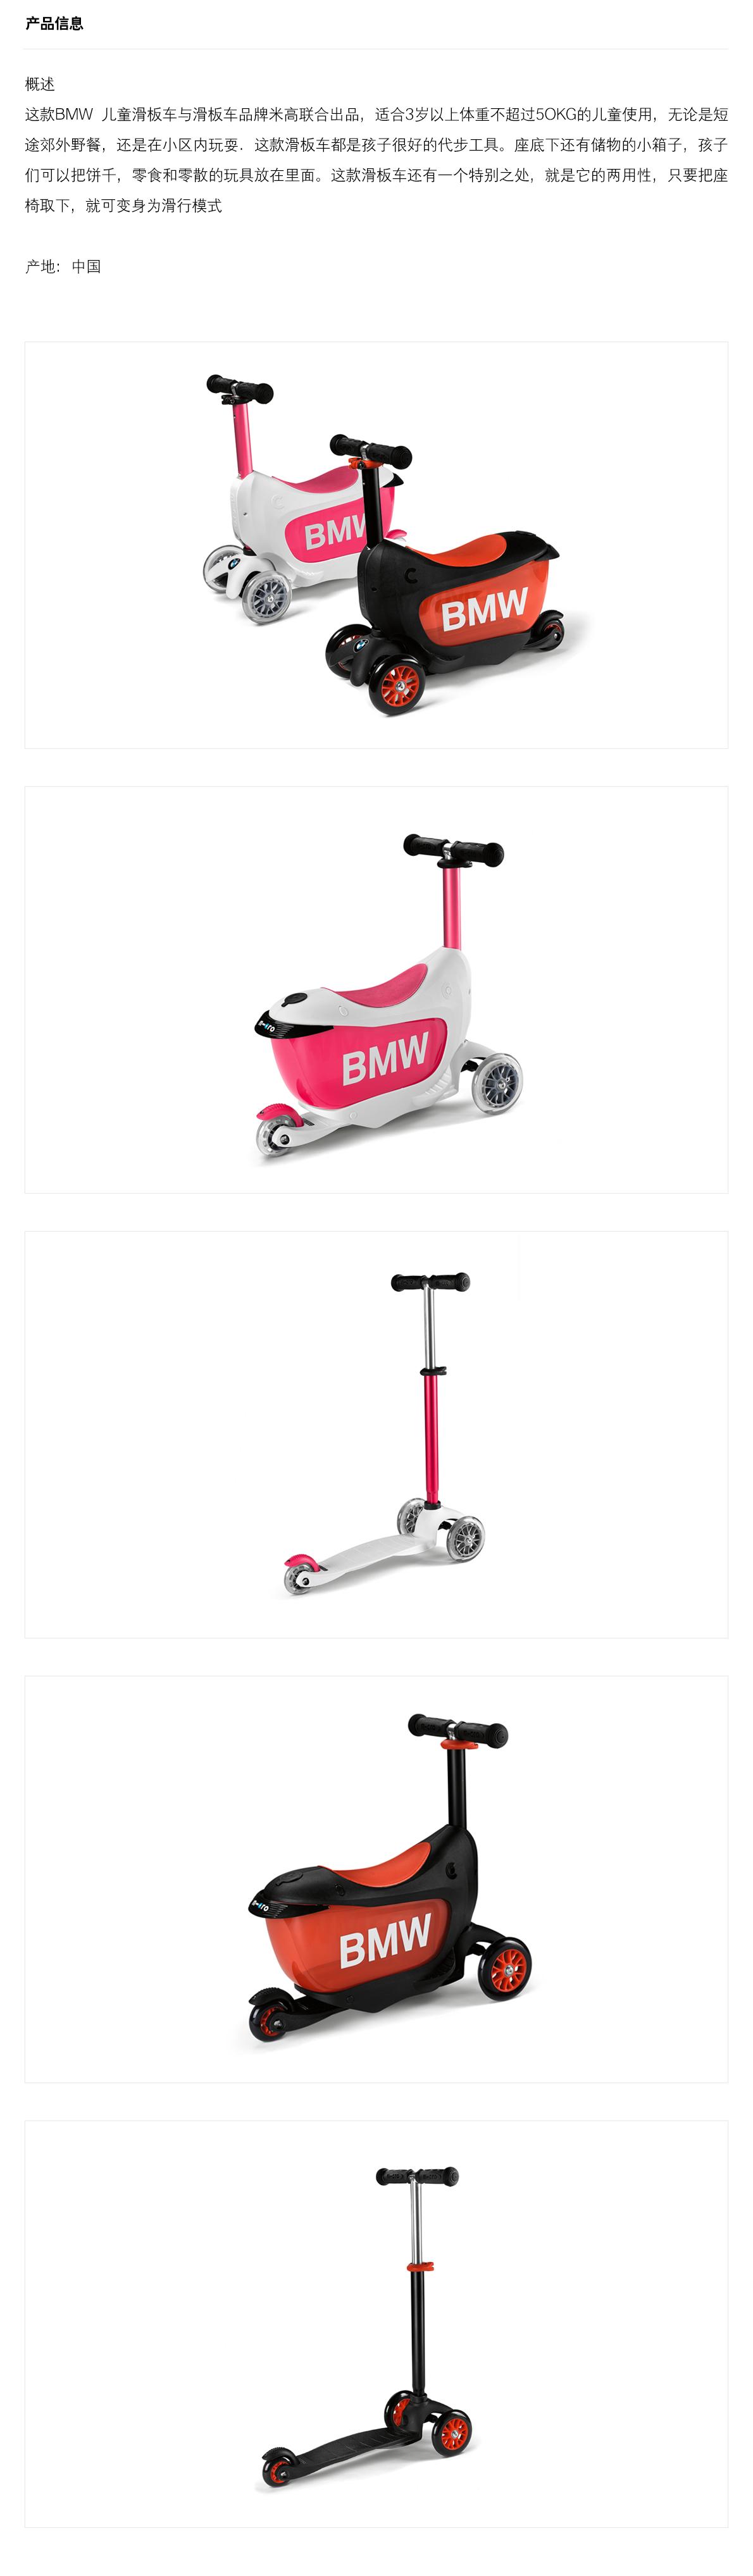 BMW 米高 儿童滑板车三轮脚踏车滑滑车两用车